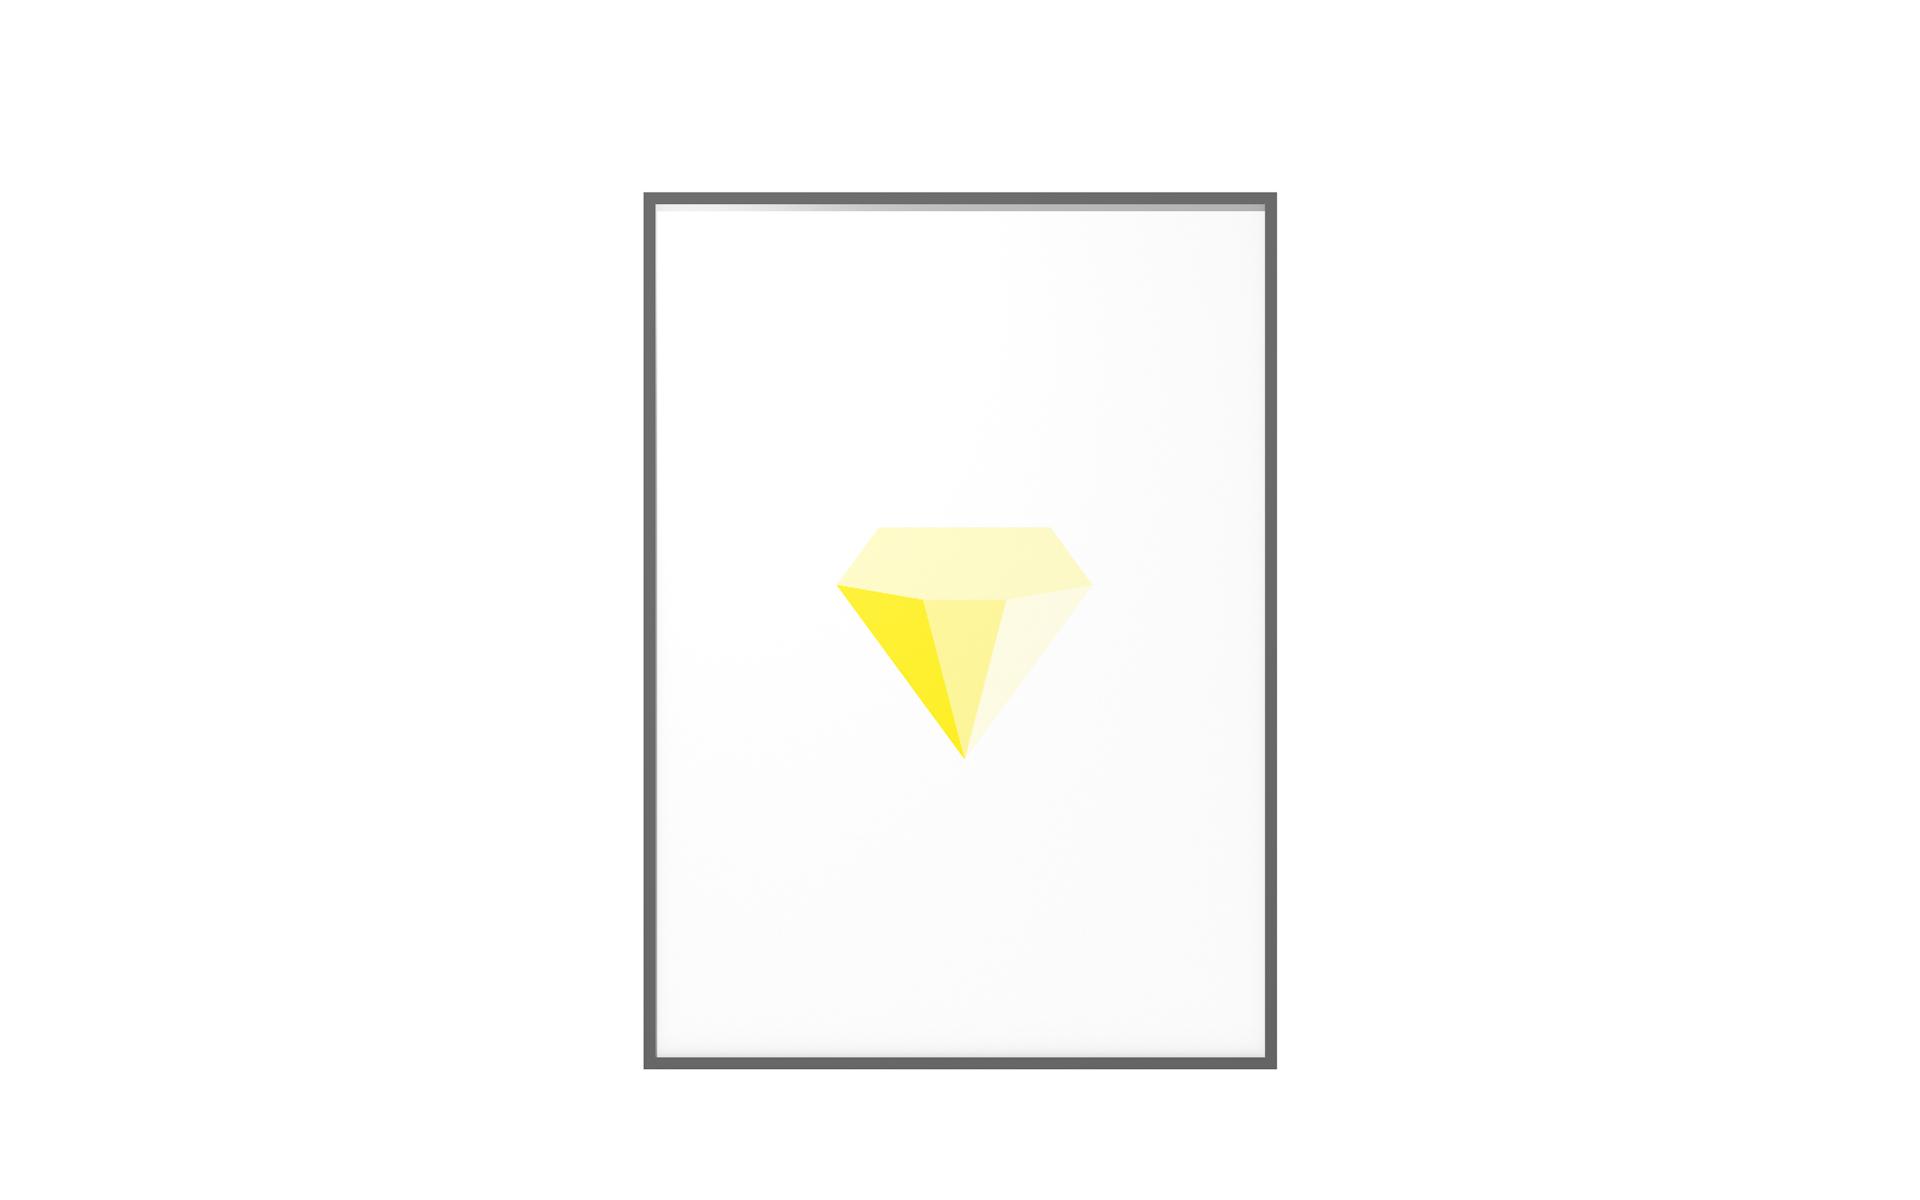 diamond[16bit]